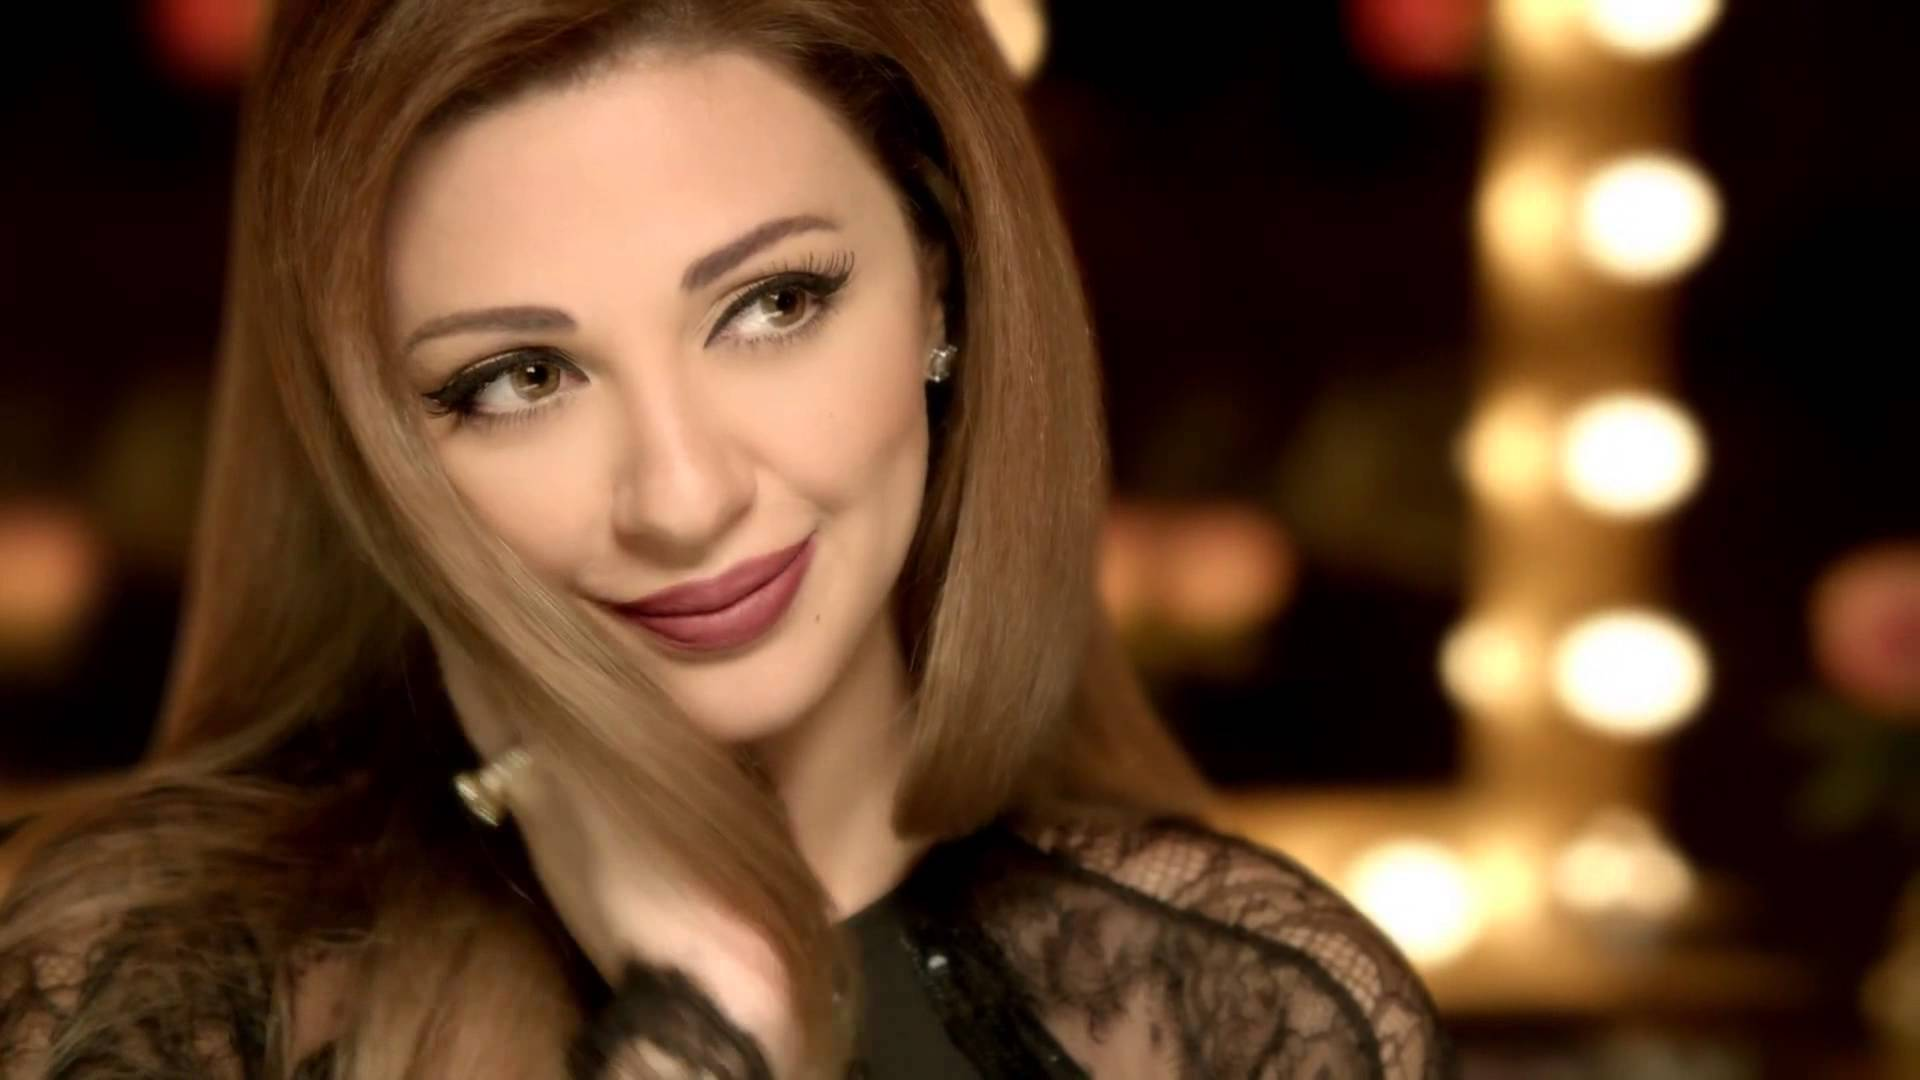 Arab egypt in niqab hijab anal masturbation on webcam 5